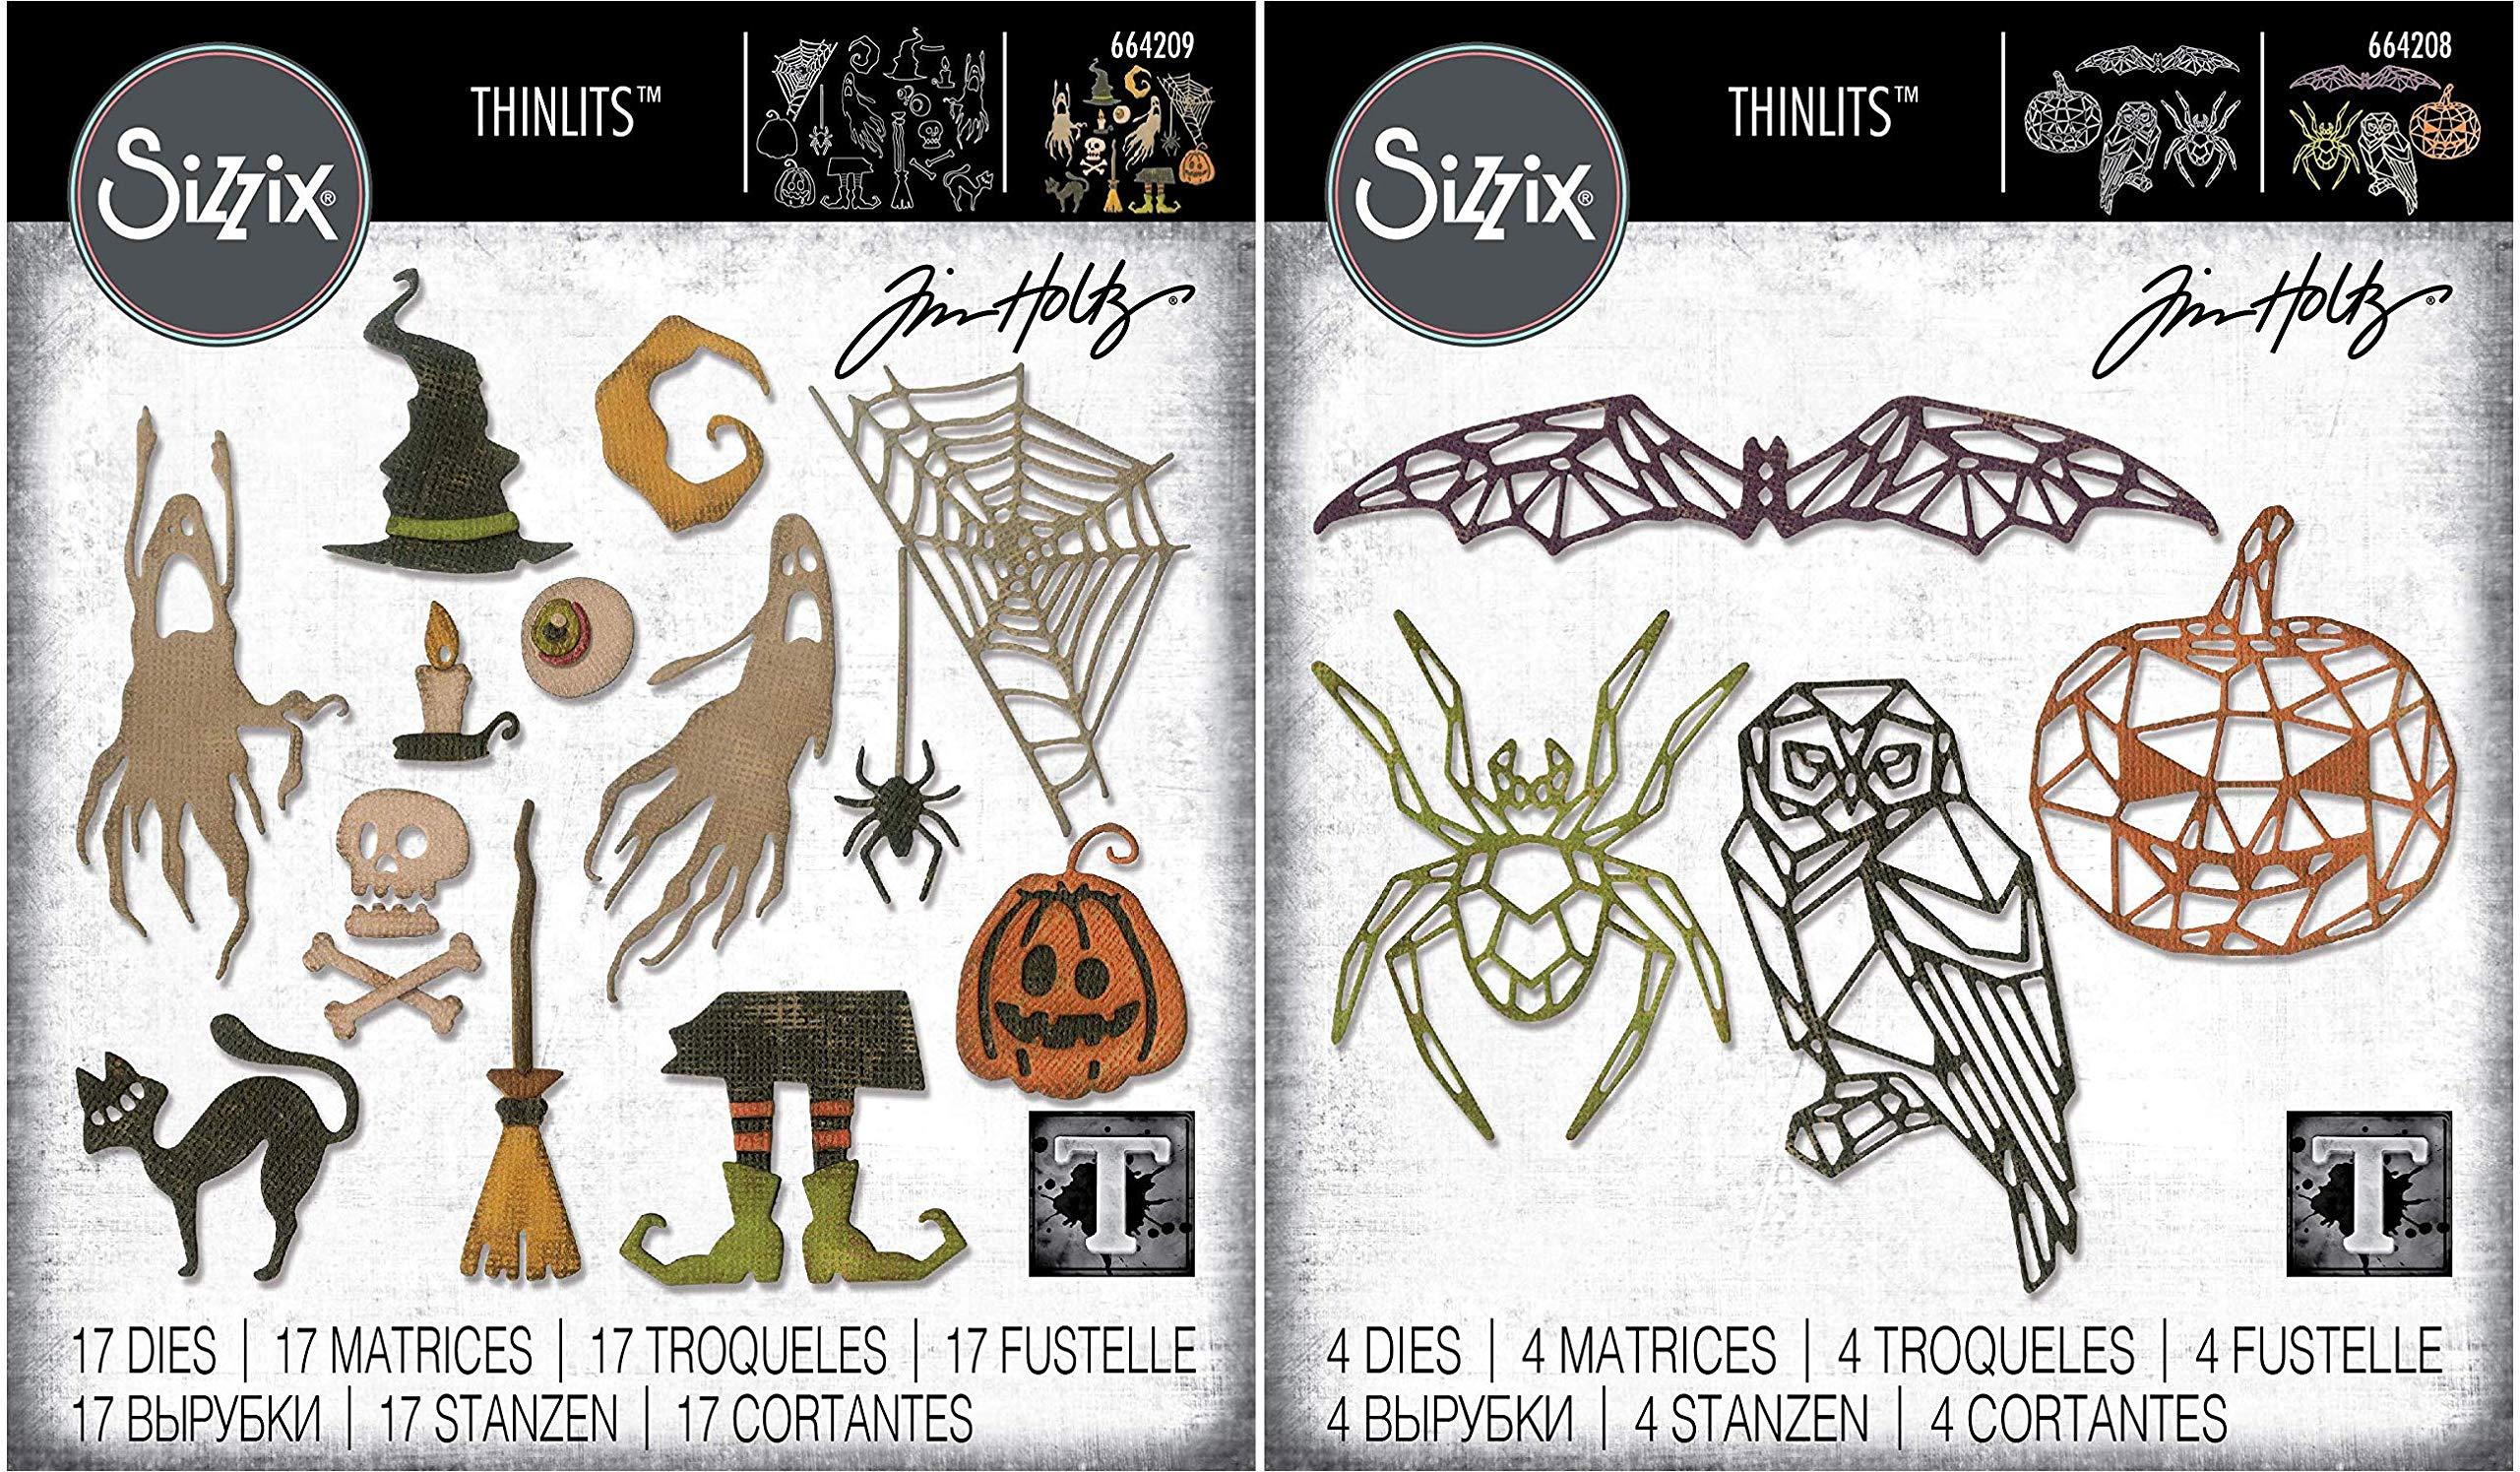 Tim Holtz Sizzix Halloween 2019 Thinlit Set - Frightful Things and Geo Halloween - 2 Items